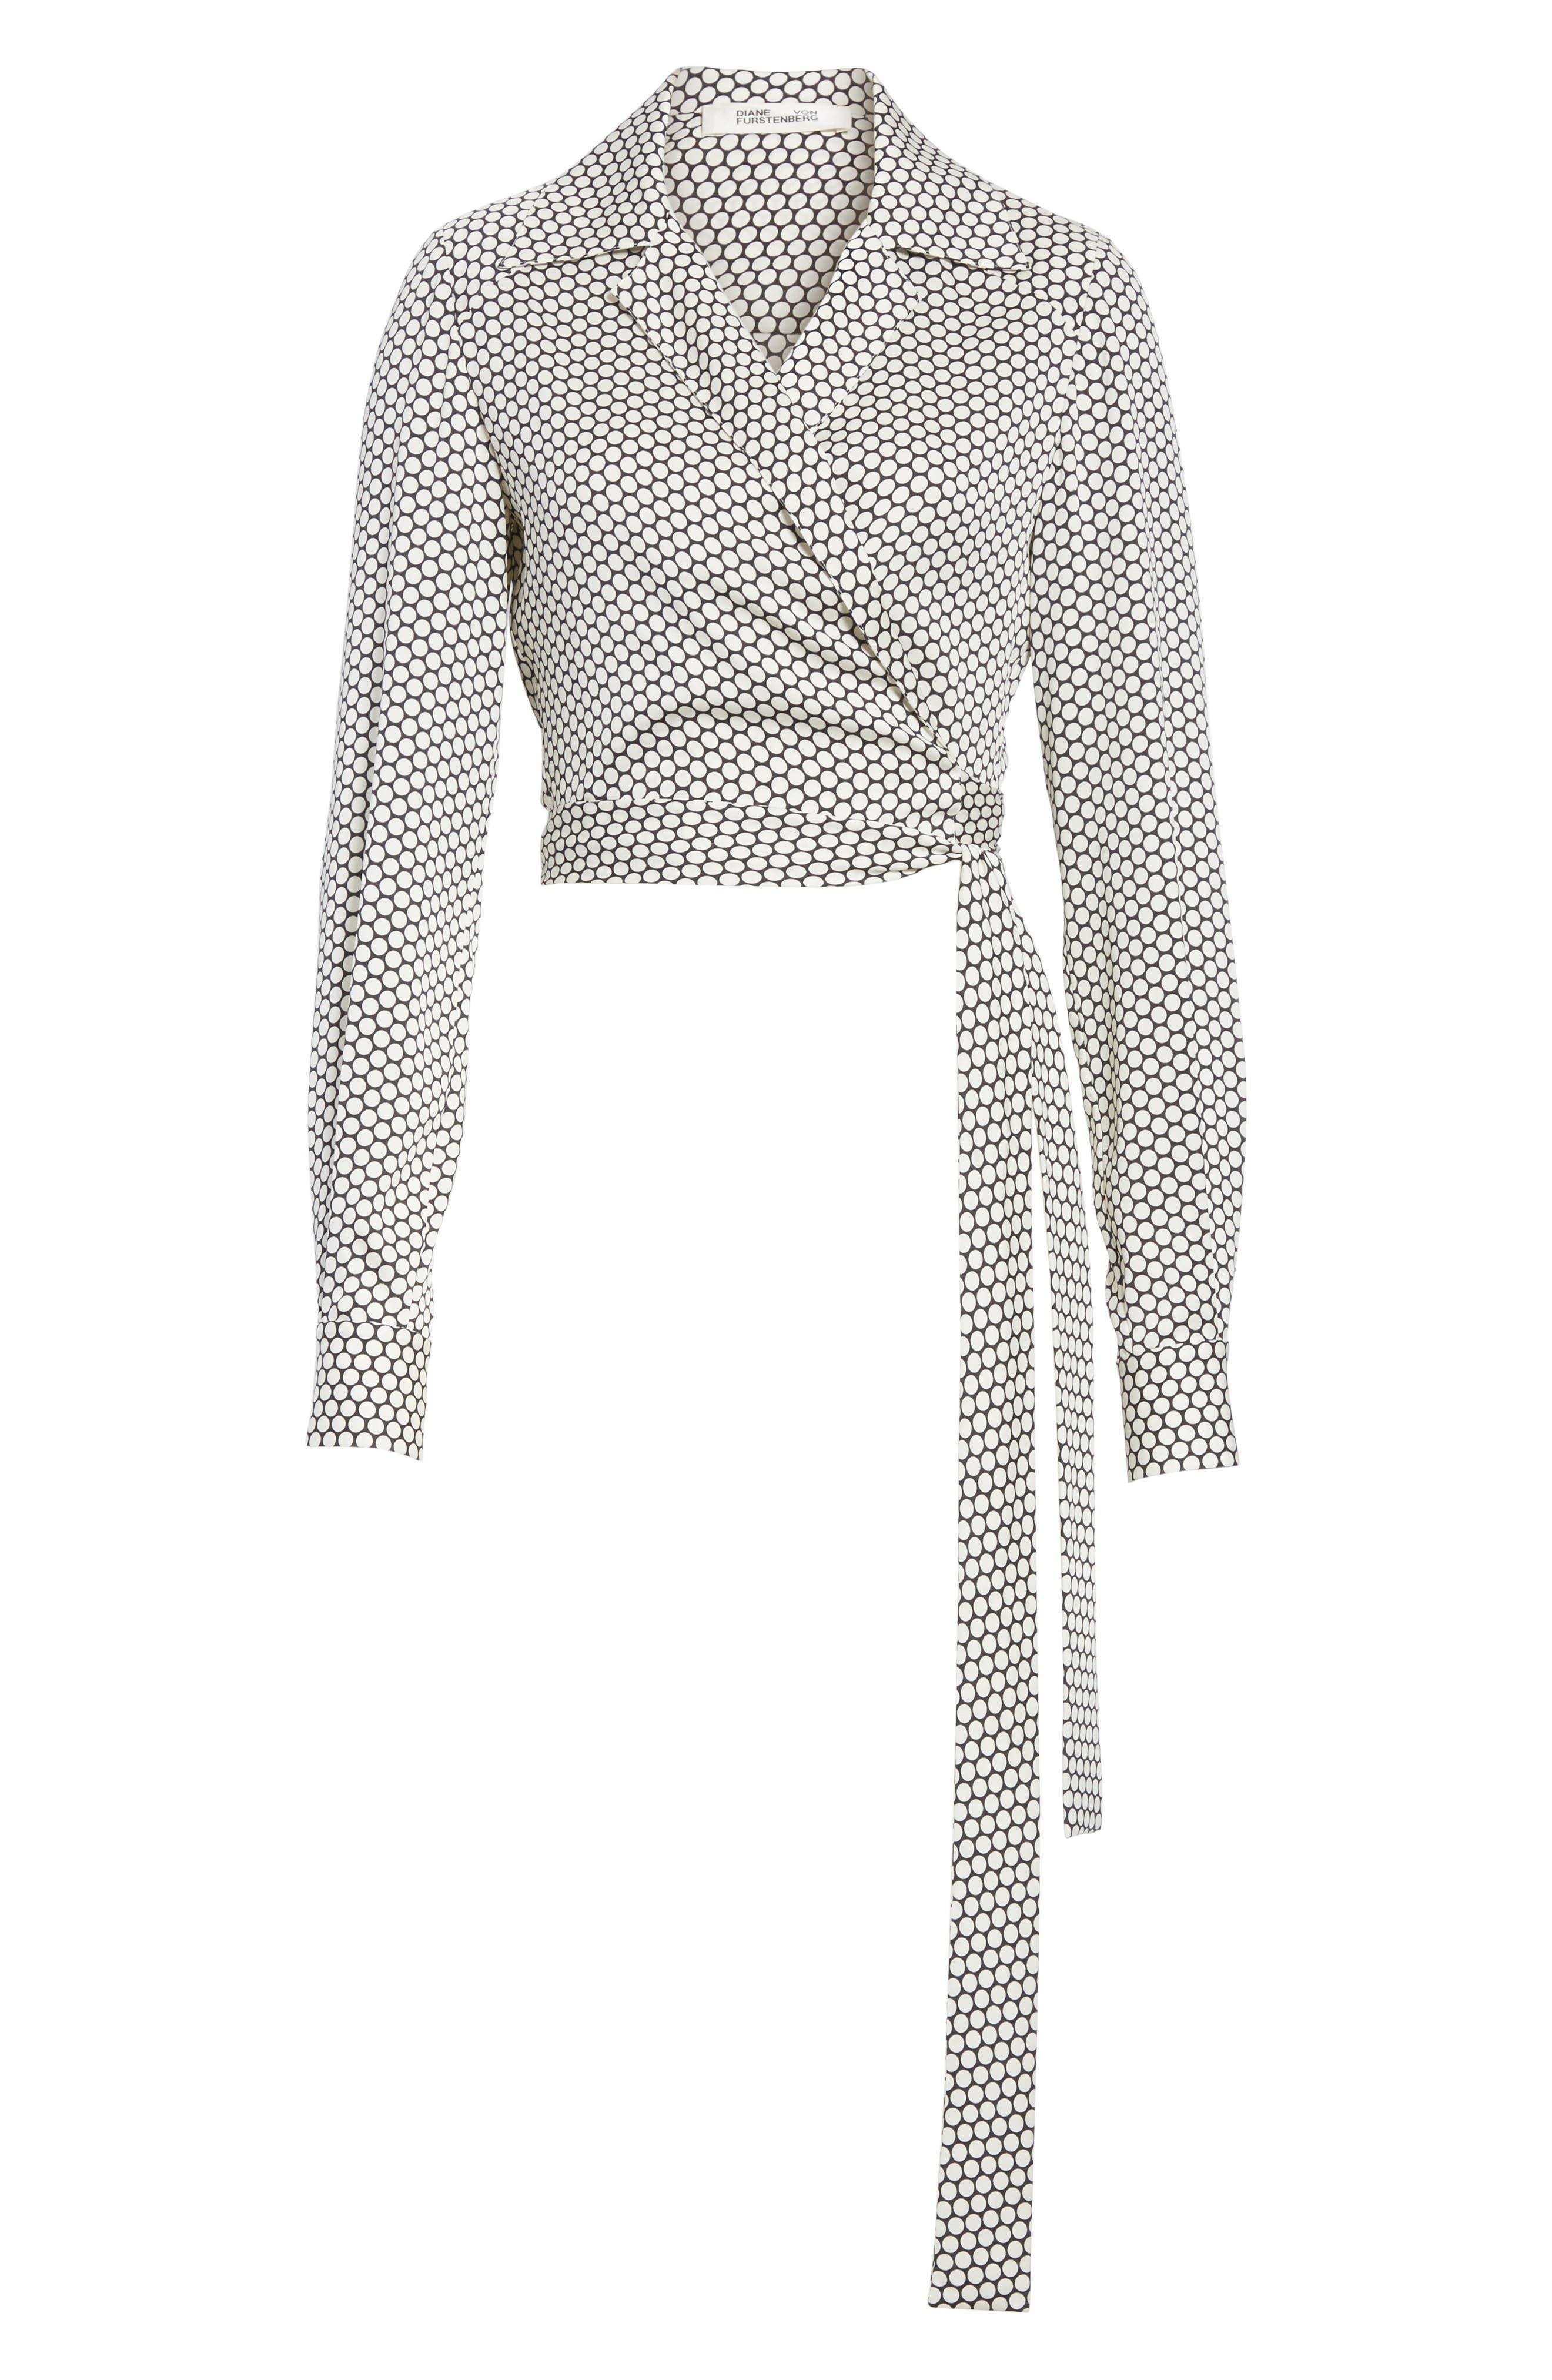 Diane von Furstenberg Stretch Silk Wrap Blouse,                             Alternate thumbnail 6, color,                             105